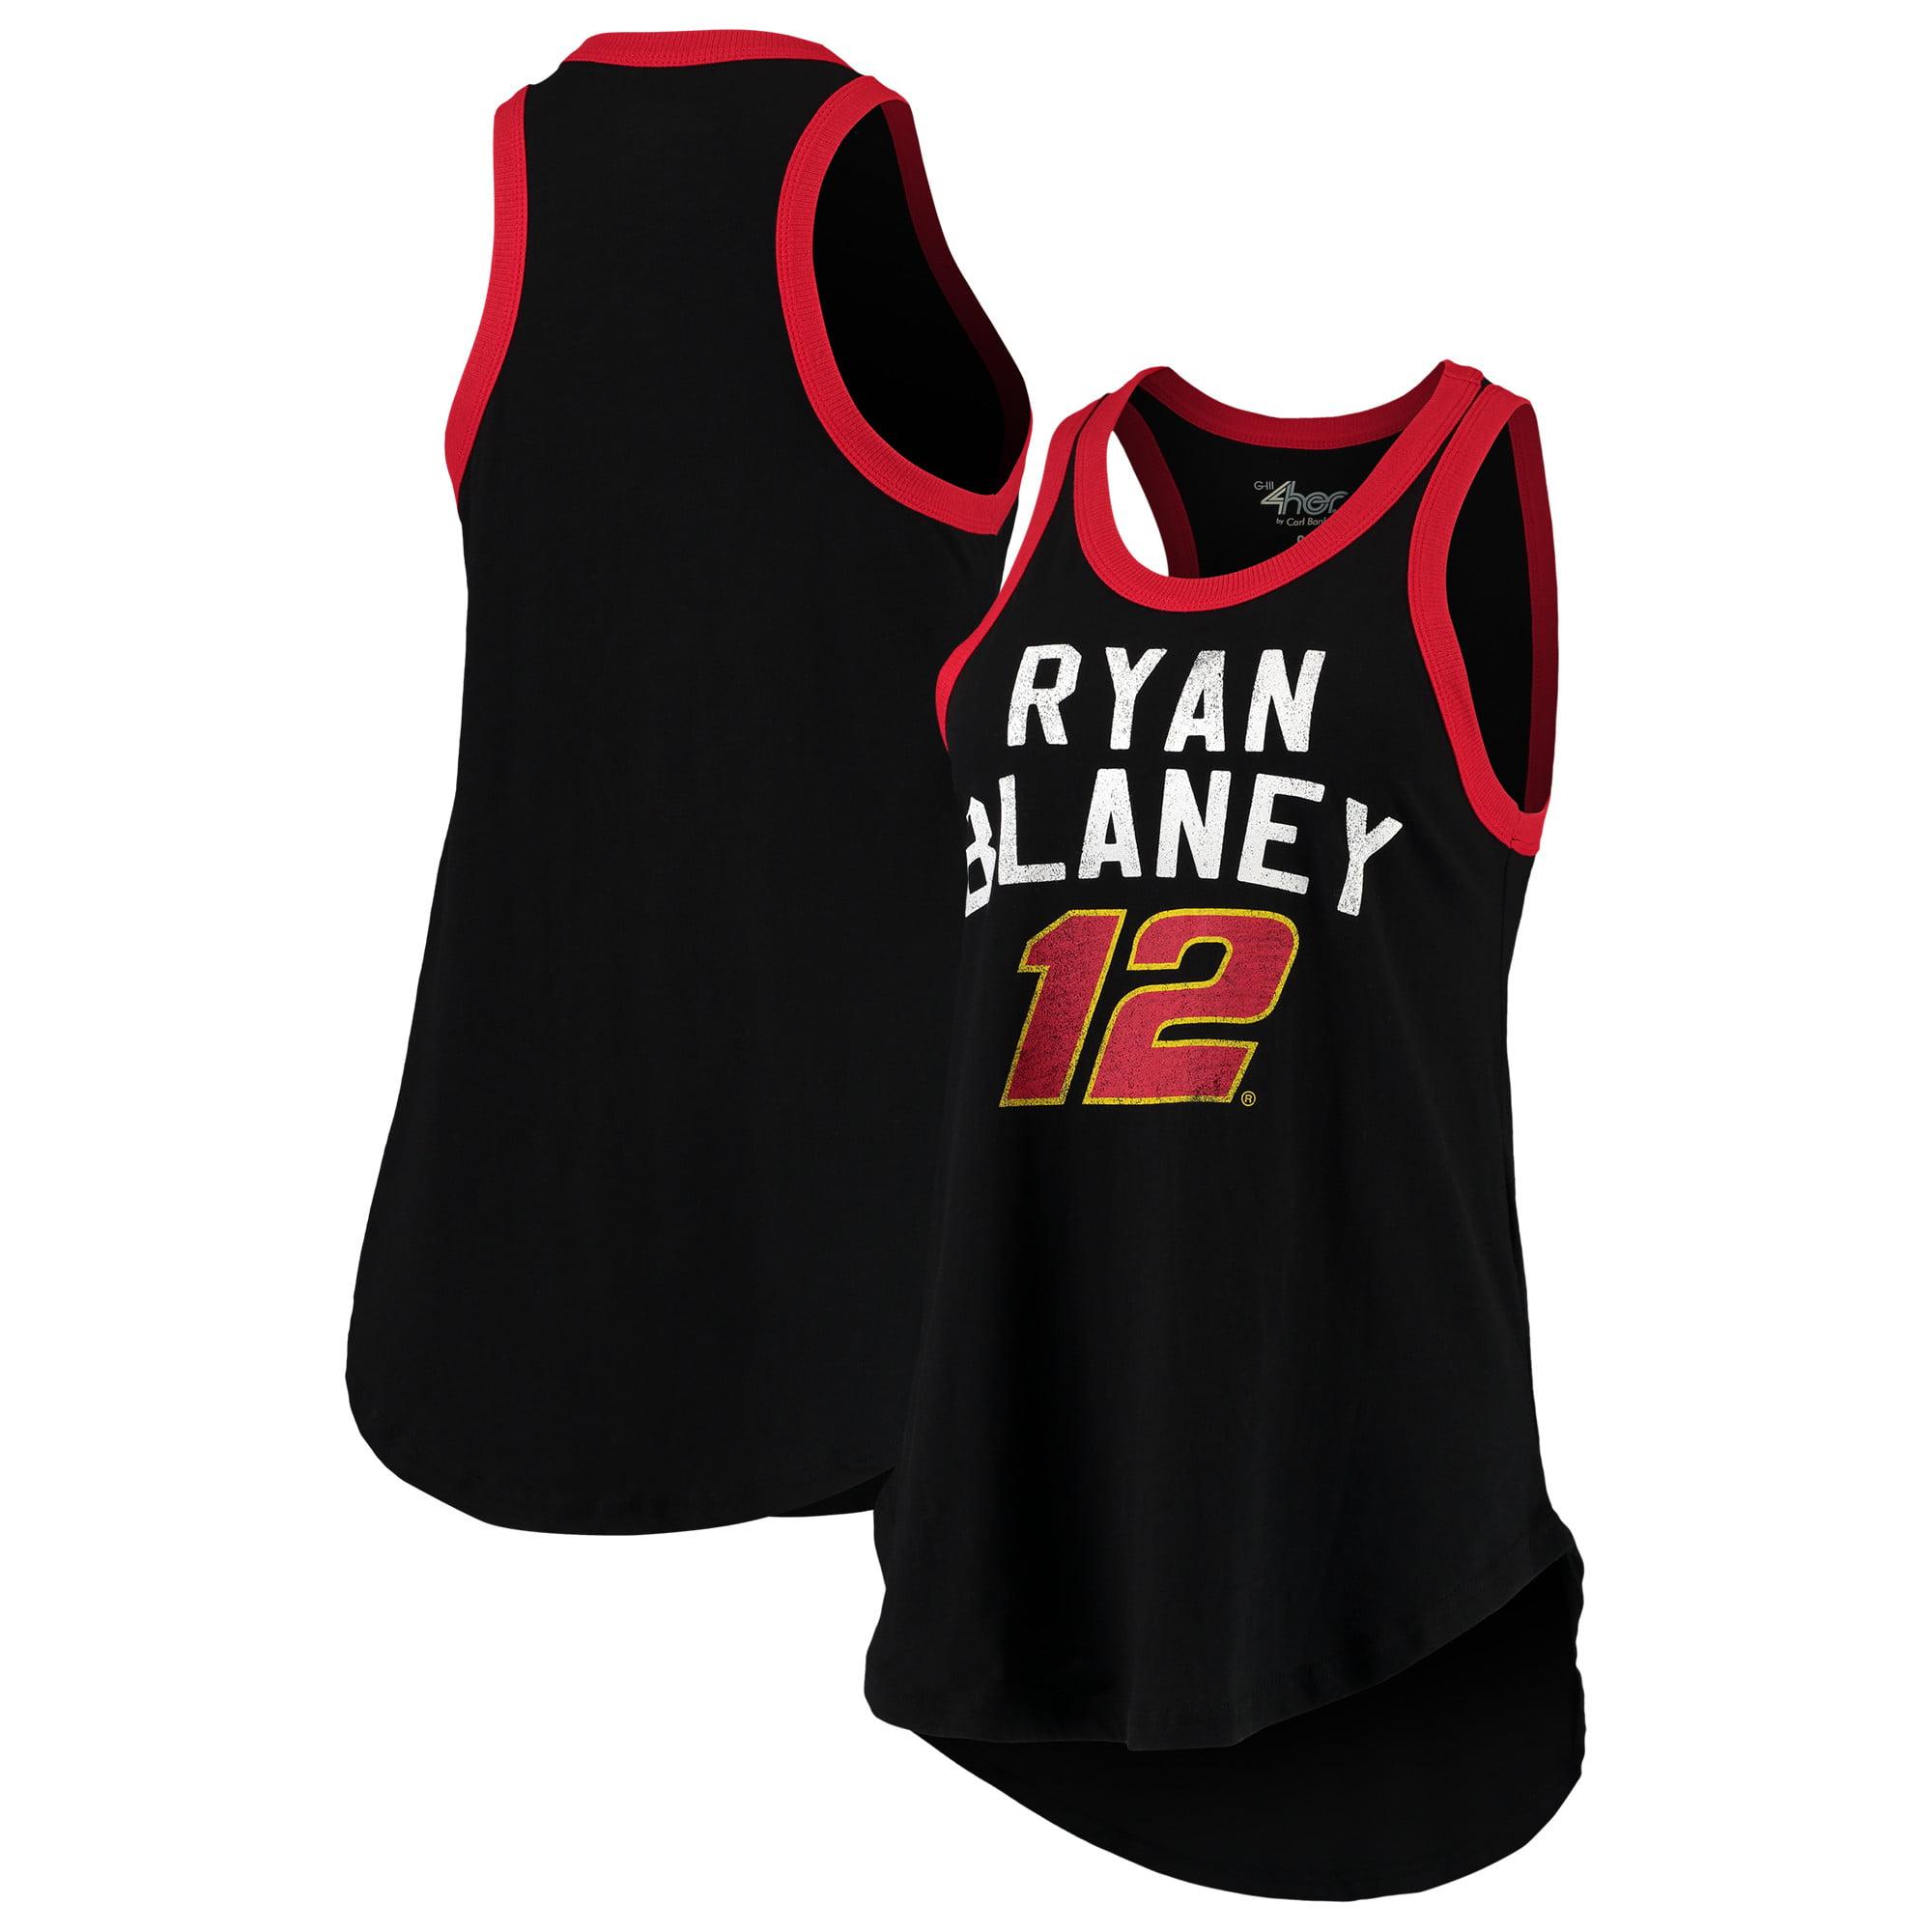 Ryan Blaney G-III 4Her by Carl Banks Women's Training Day Tank Top - Black